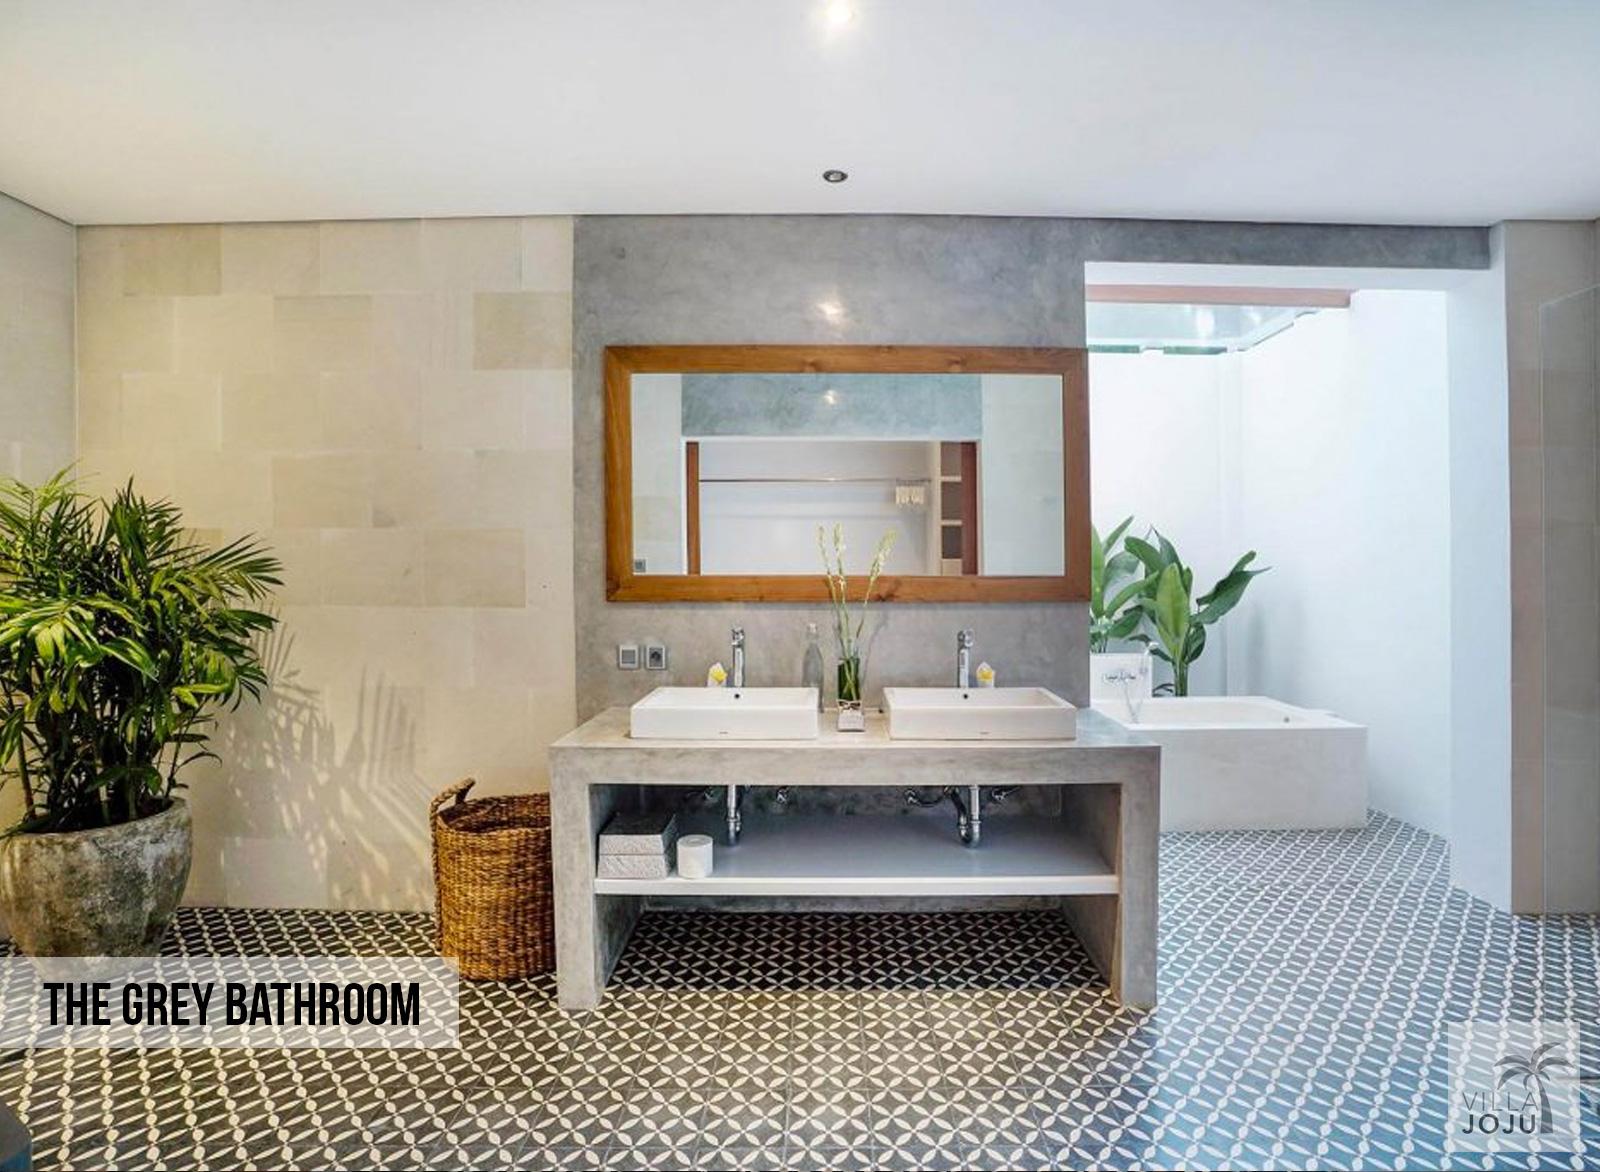 The Grey Bathroom